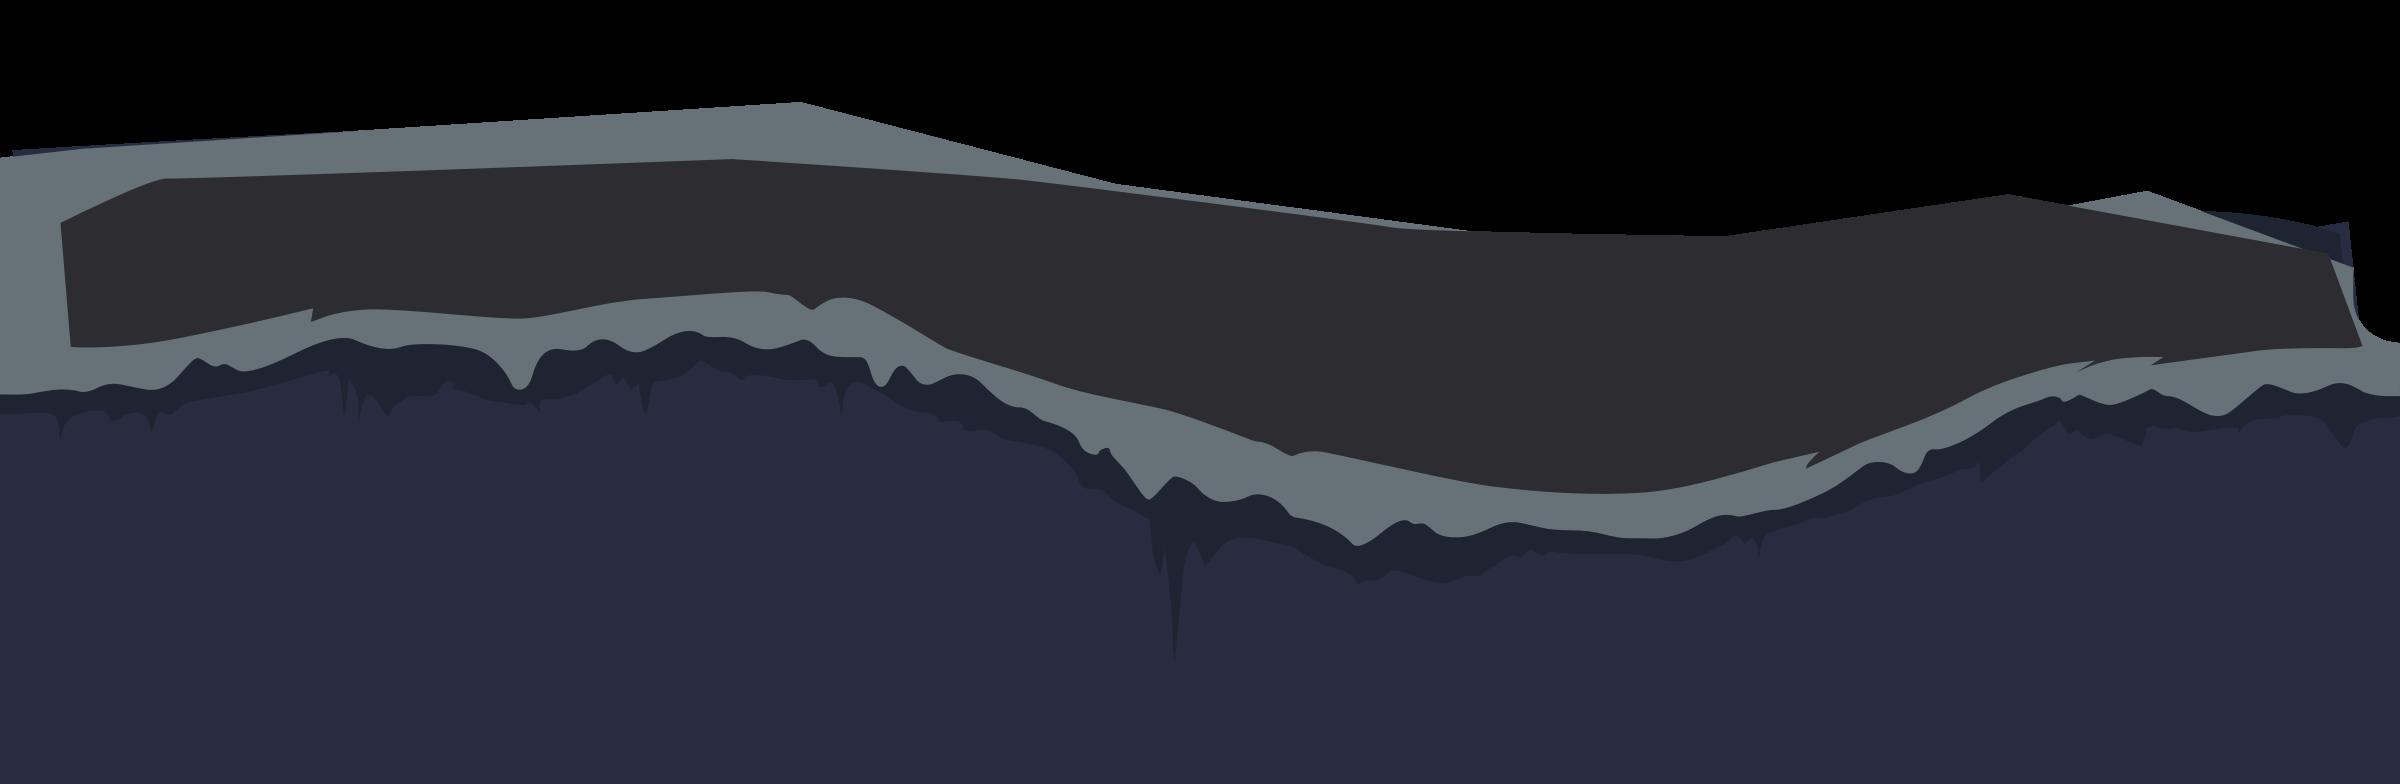 Hills clipart mountain slope. Ilmenskie cave gr edge